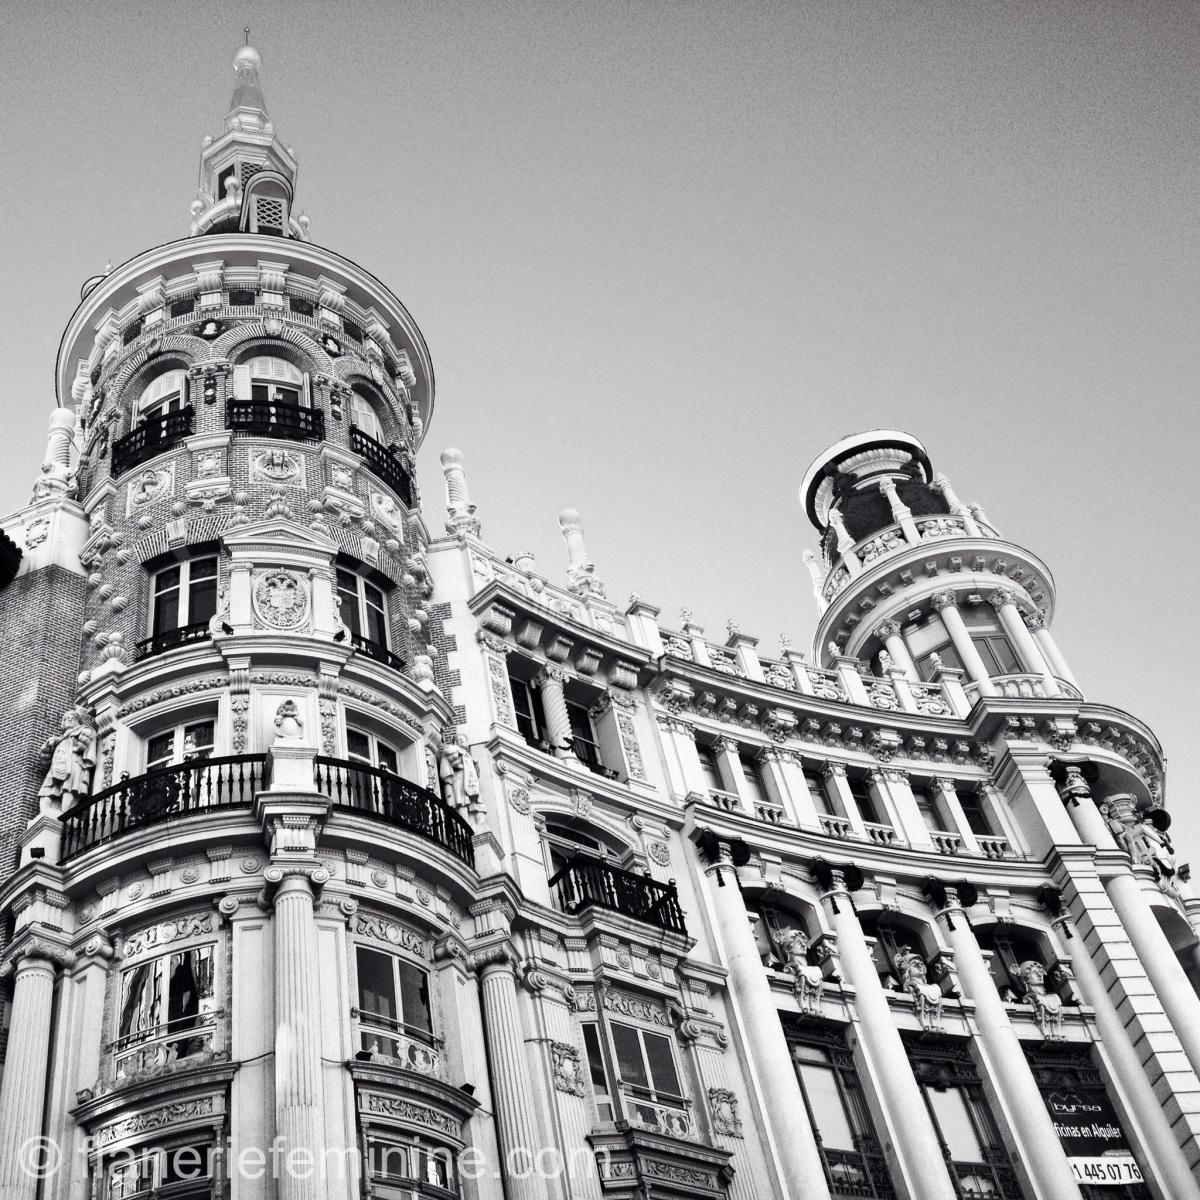 Madrid in black & white